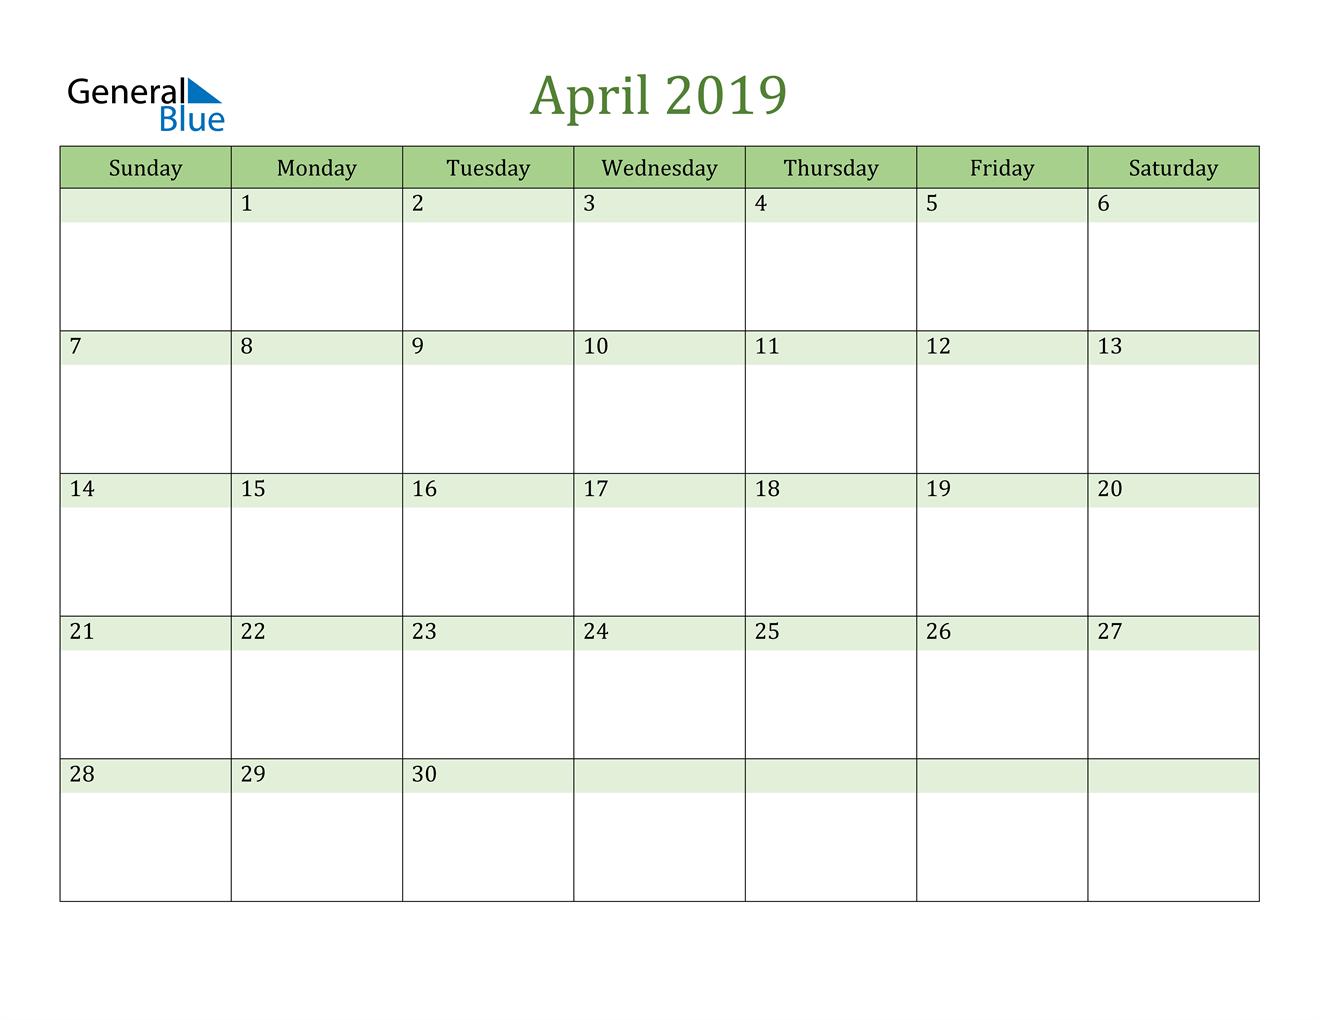 Image of April 2019 Cool and Relaxing Green Calendar Calendar